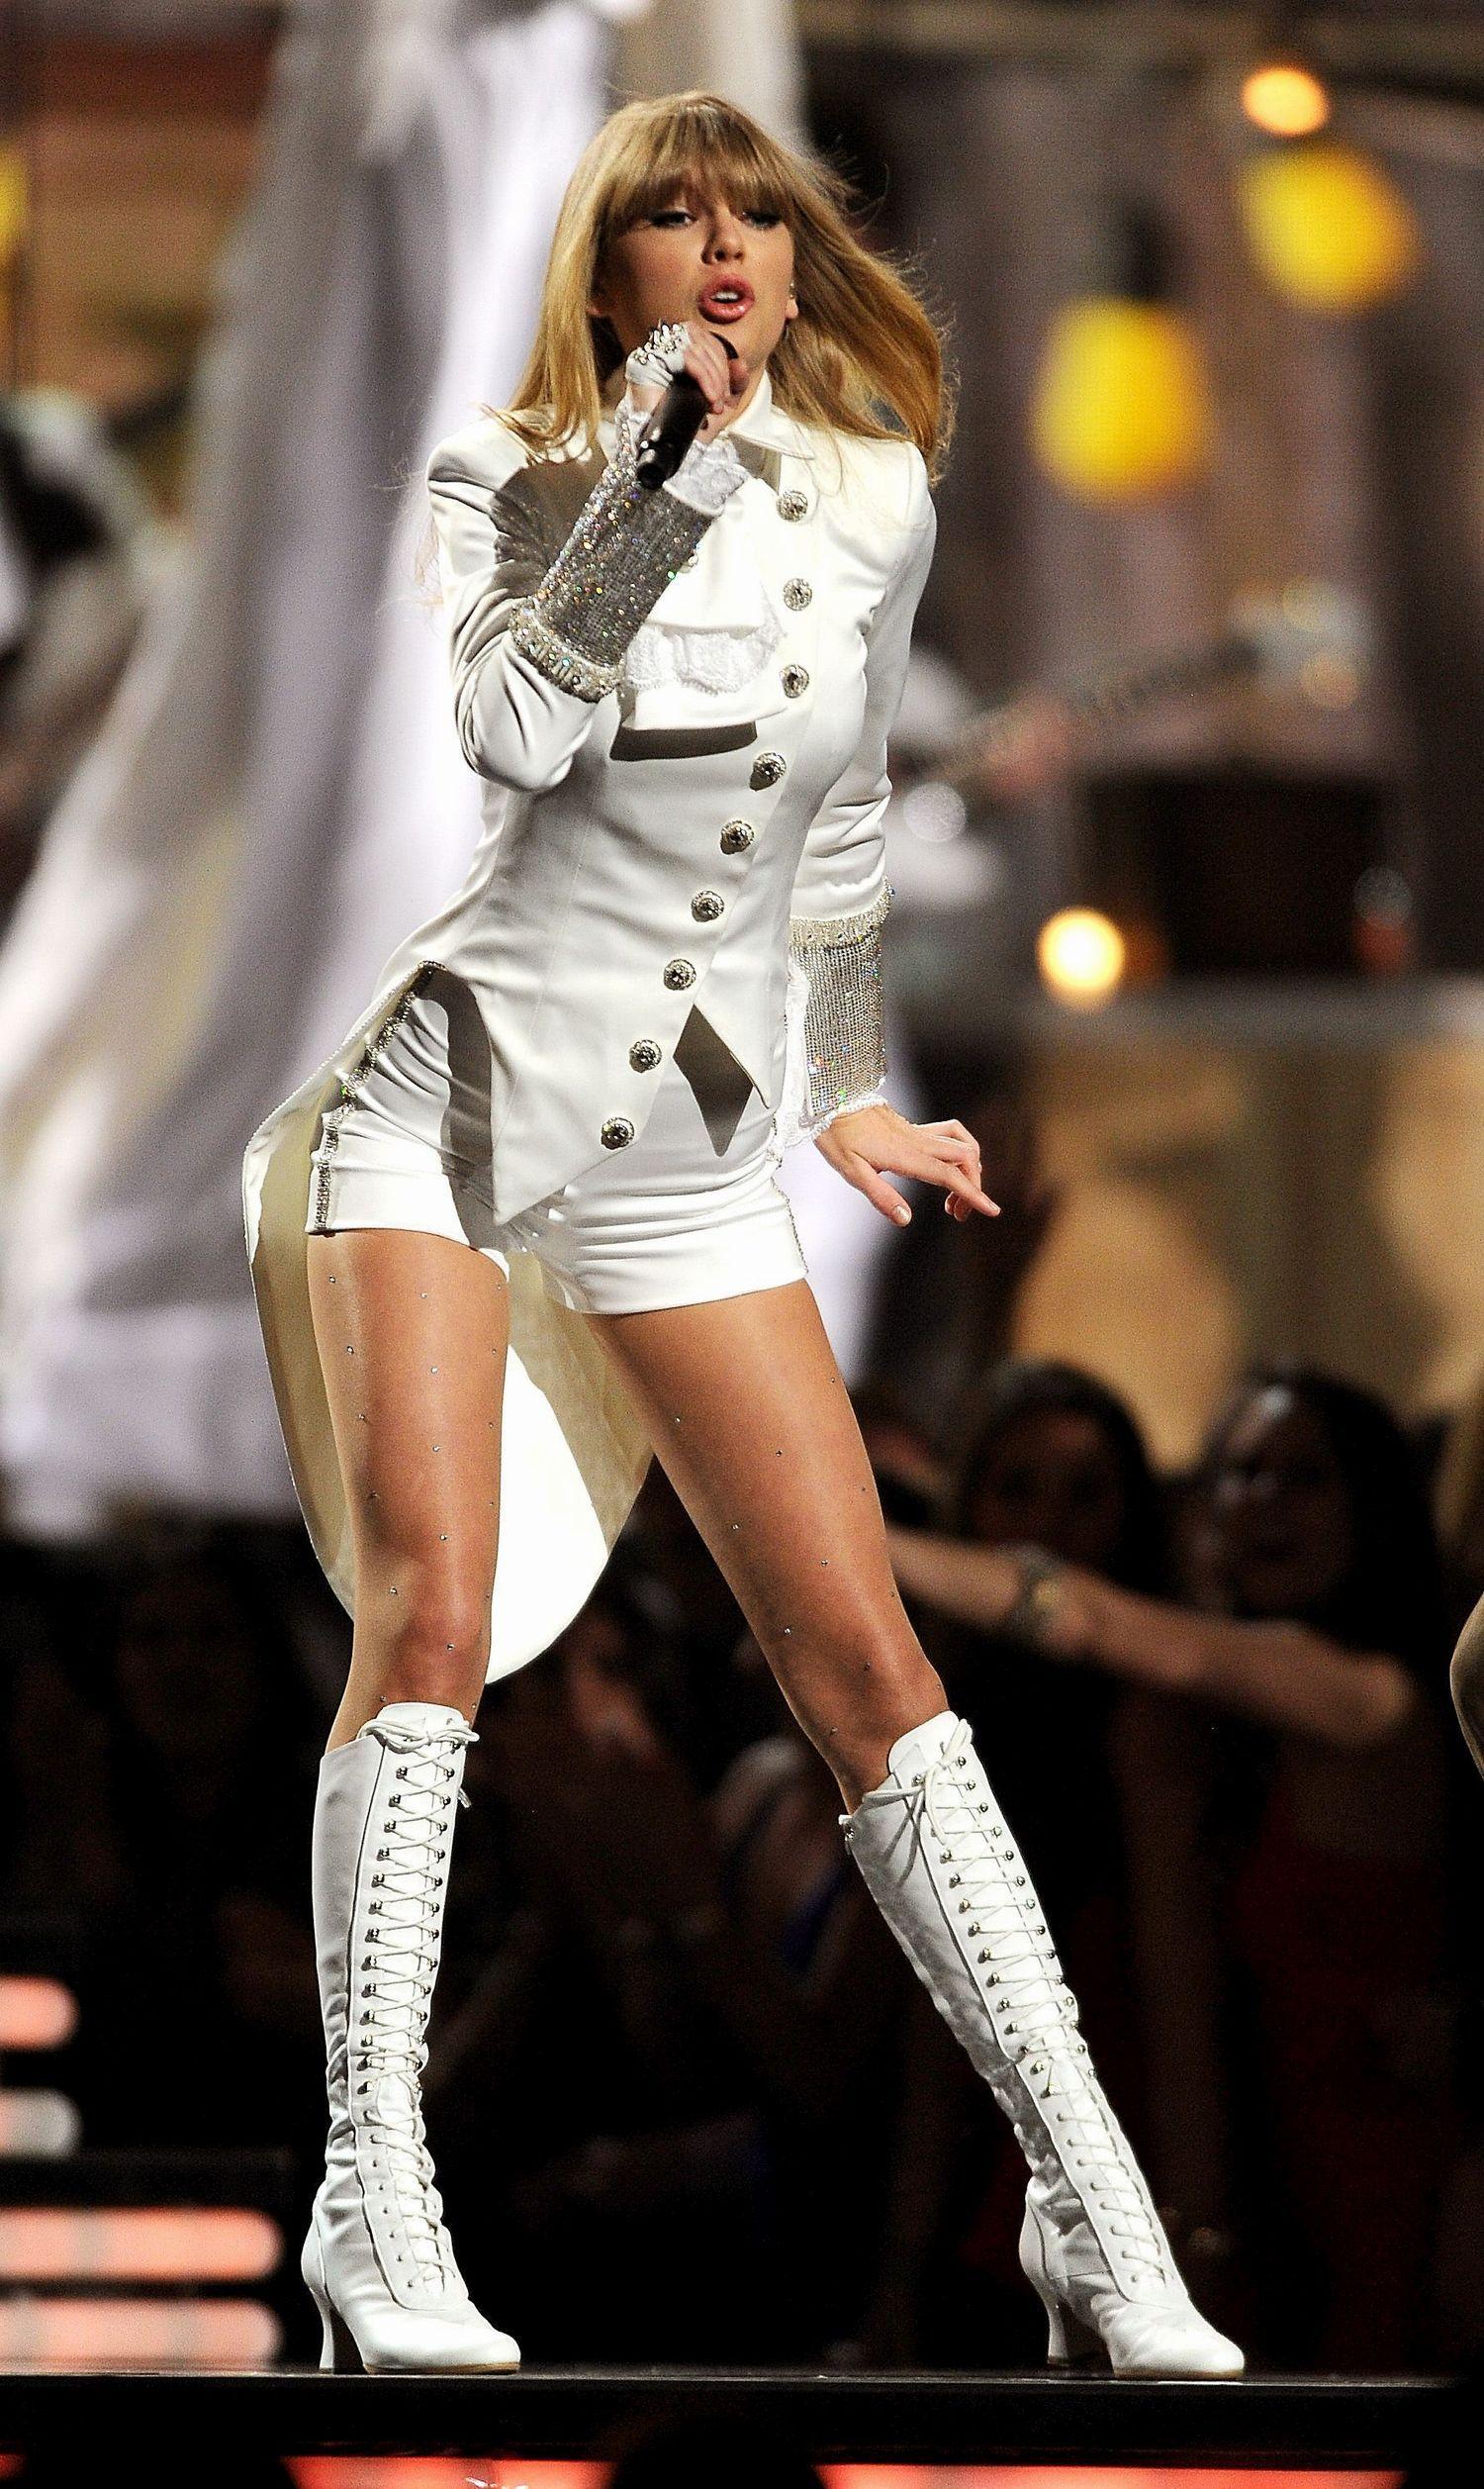 Taylor Swift In Pantyhose - Httpstockings-Celebs -5380